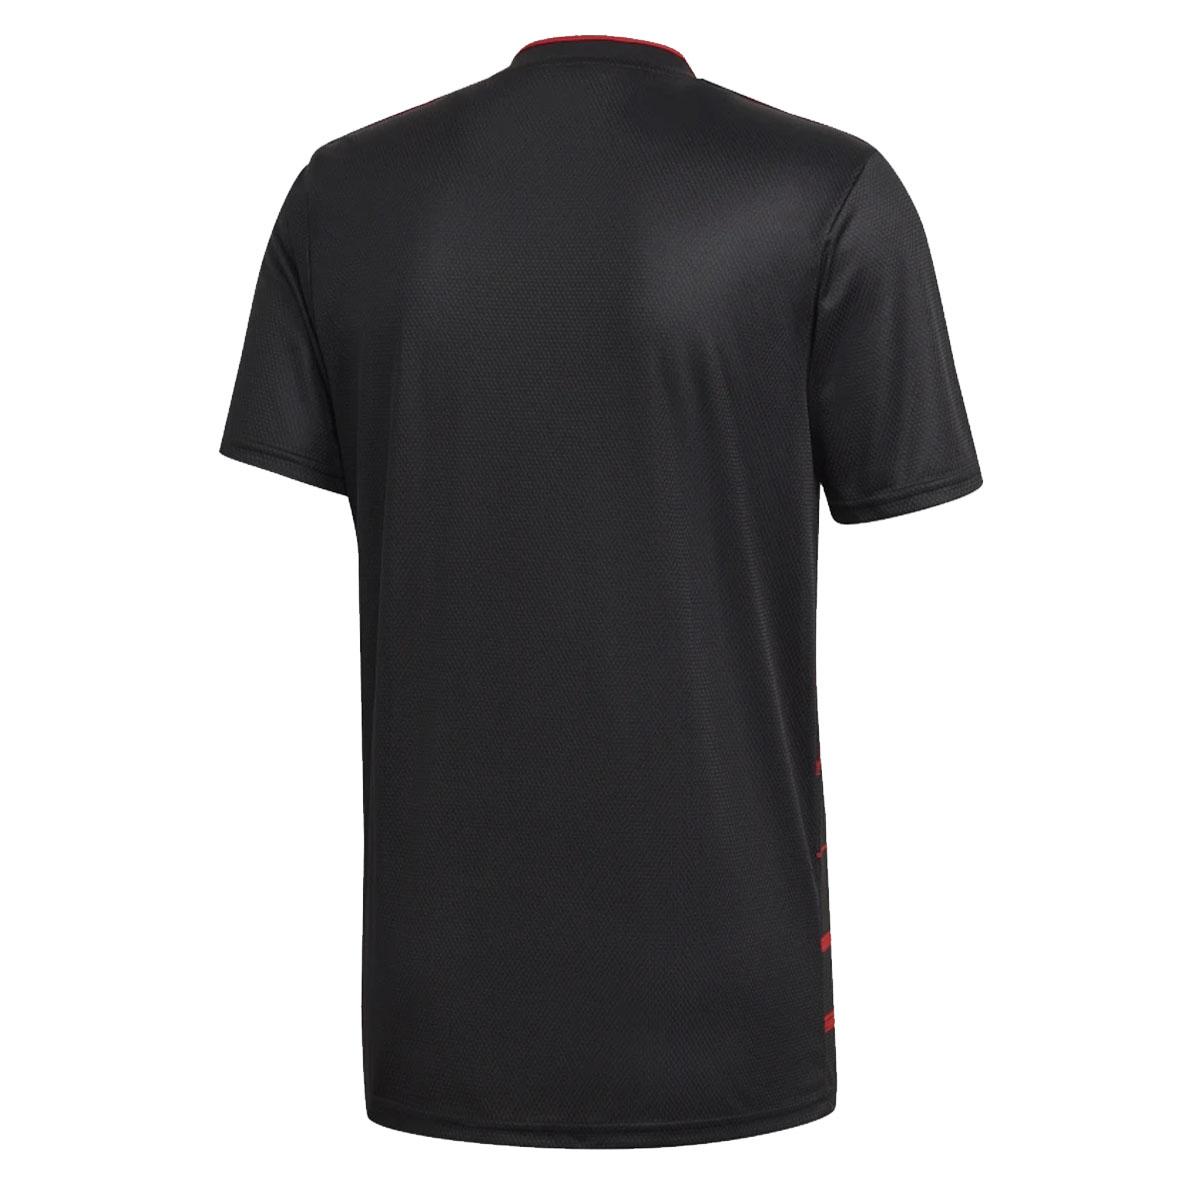 Camisa Adidas Flamengo III 20/21 Torcedor s/nº Masculina